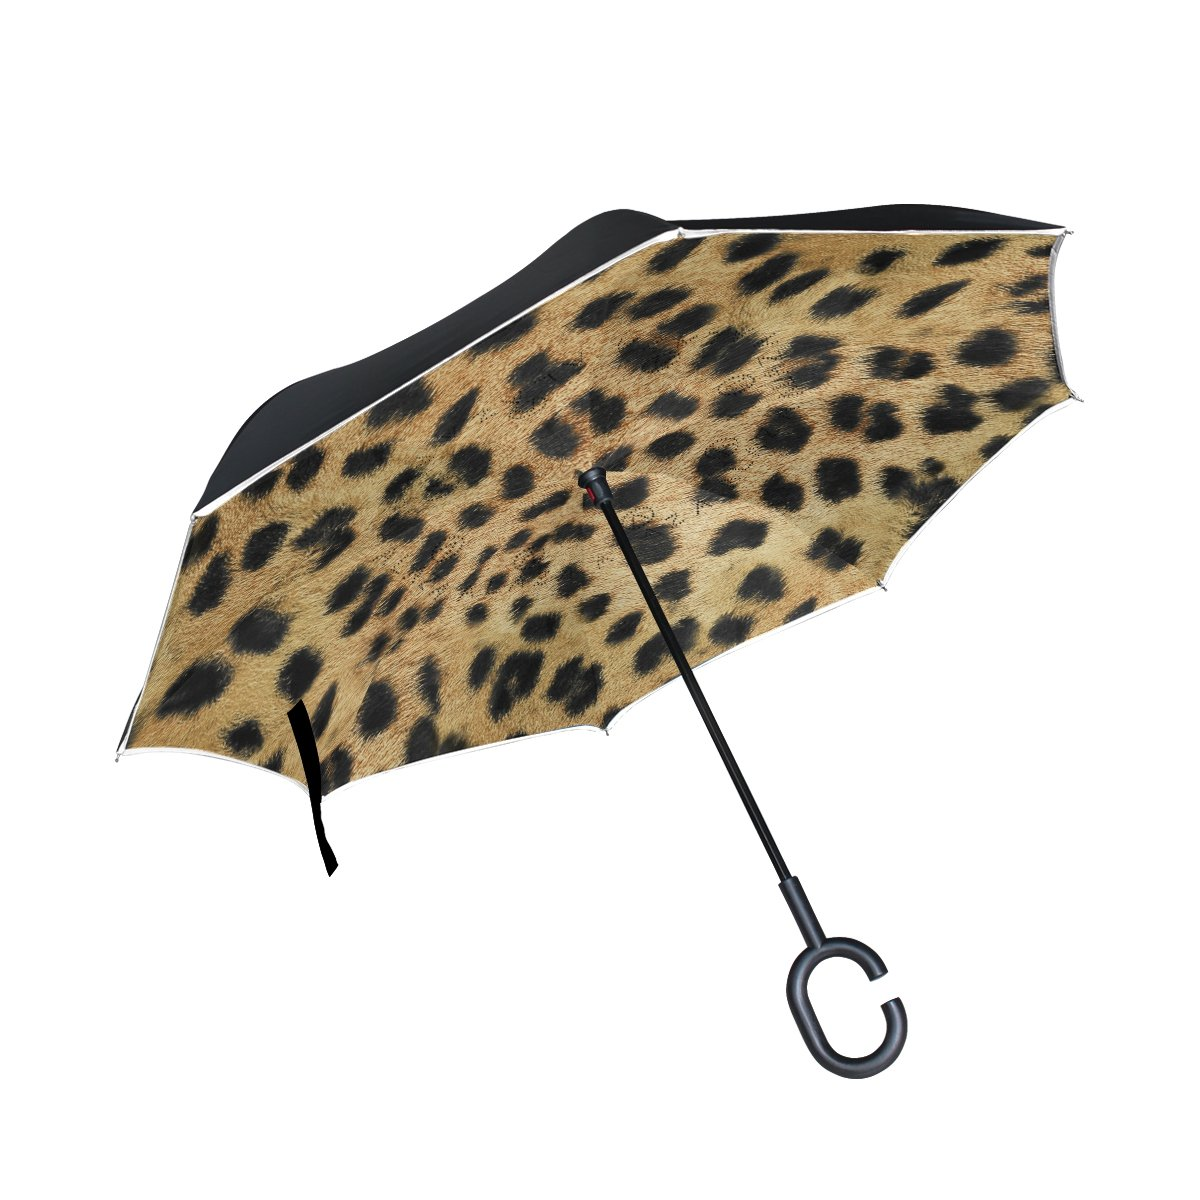 THENAHOME 逆開き 自動開き 傘 逆さま コンパクト 軽量 防風 防水 ストレート 傘 シェーディング ヒョウ柄 車 屋外用 B079DP7BCJ